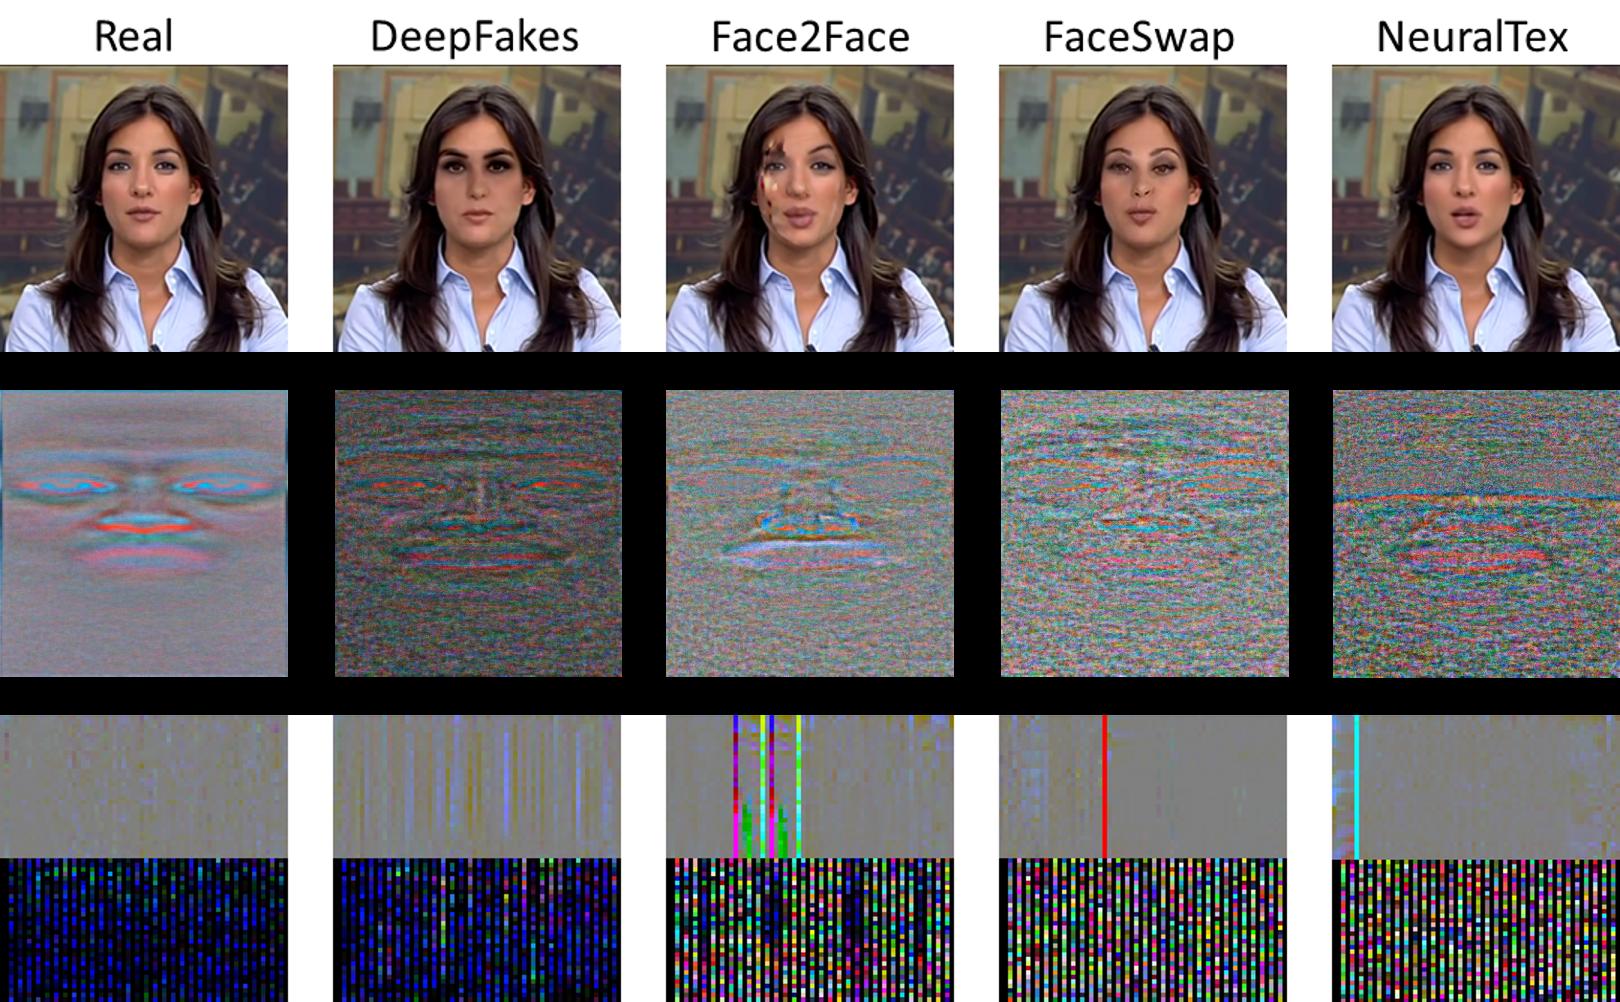 AI researchers use heartbeat detection to identify deepfake videos |  VentureBeat